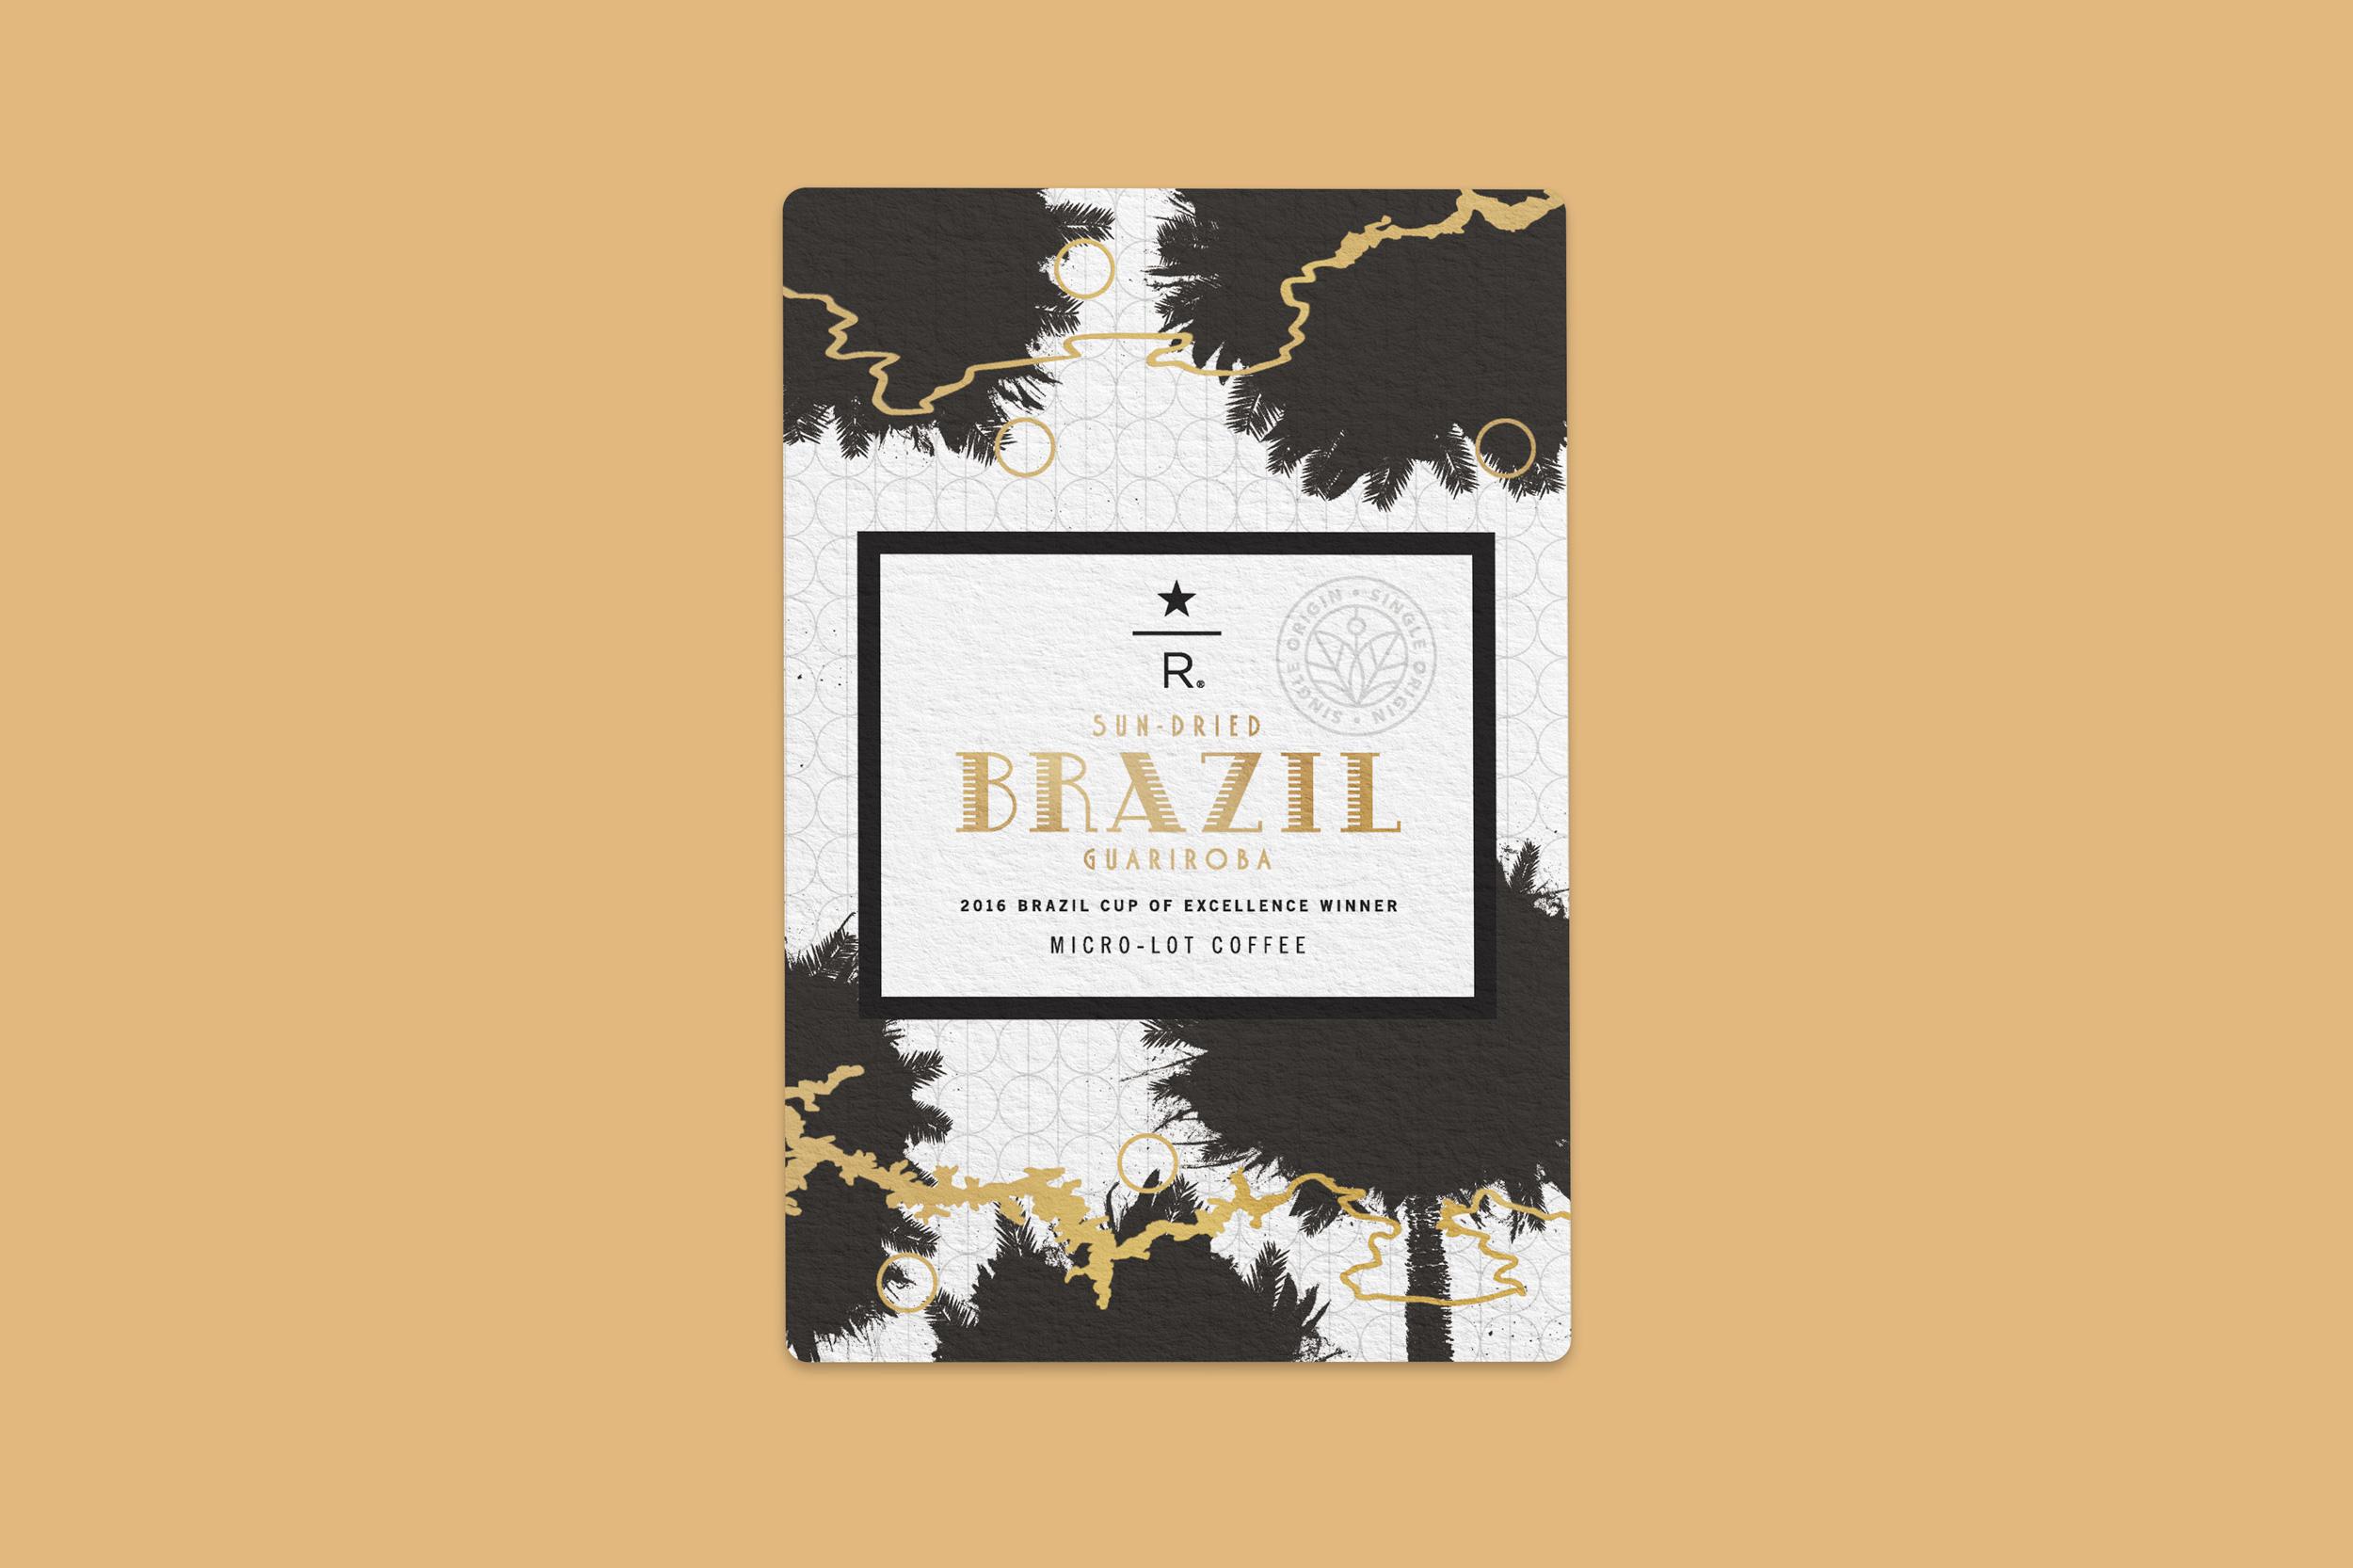 Brazil-Guariroba-Reserve-Card-DETAIL-PAPER_TEX.jpg